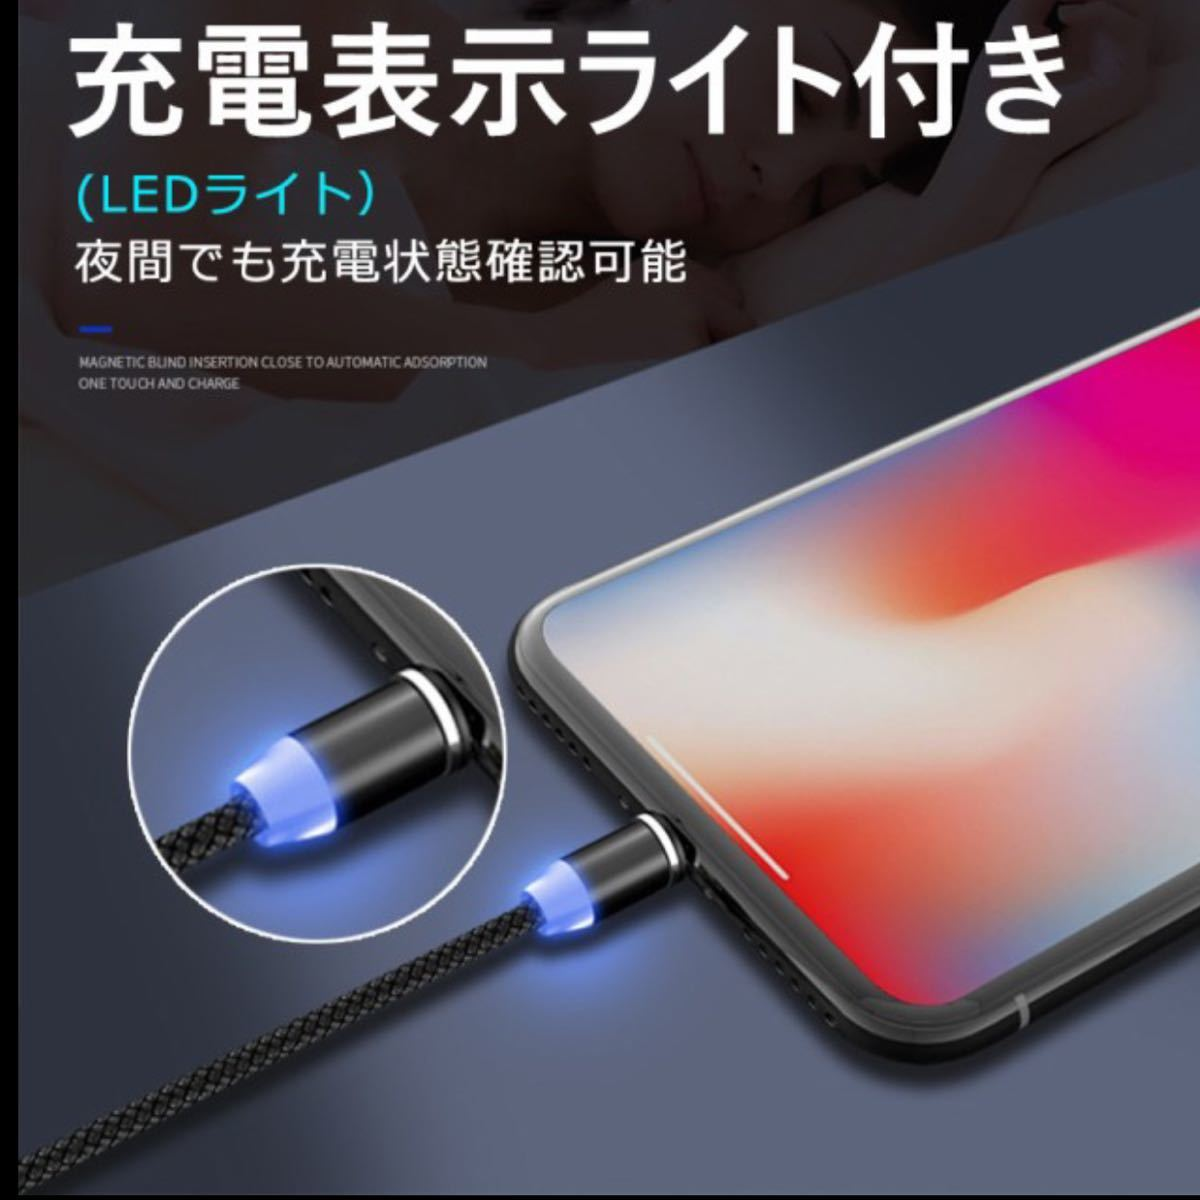 USB充電ケーブル 1m 360度マグネット脱着式 端子3種類 ブラック